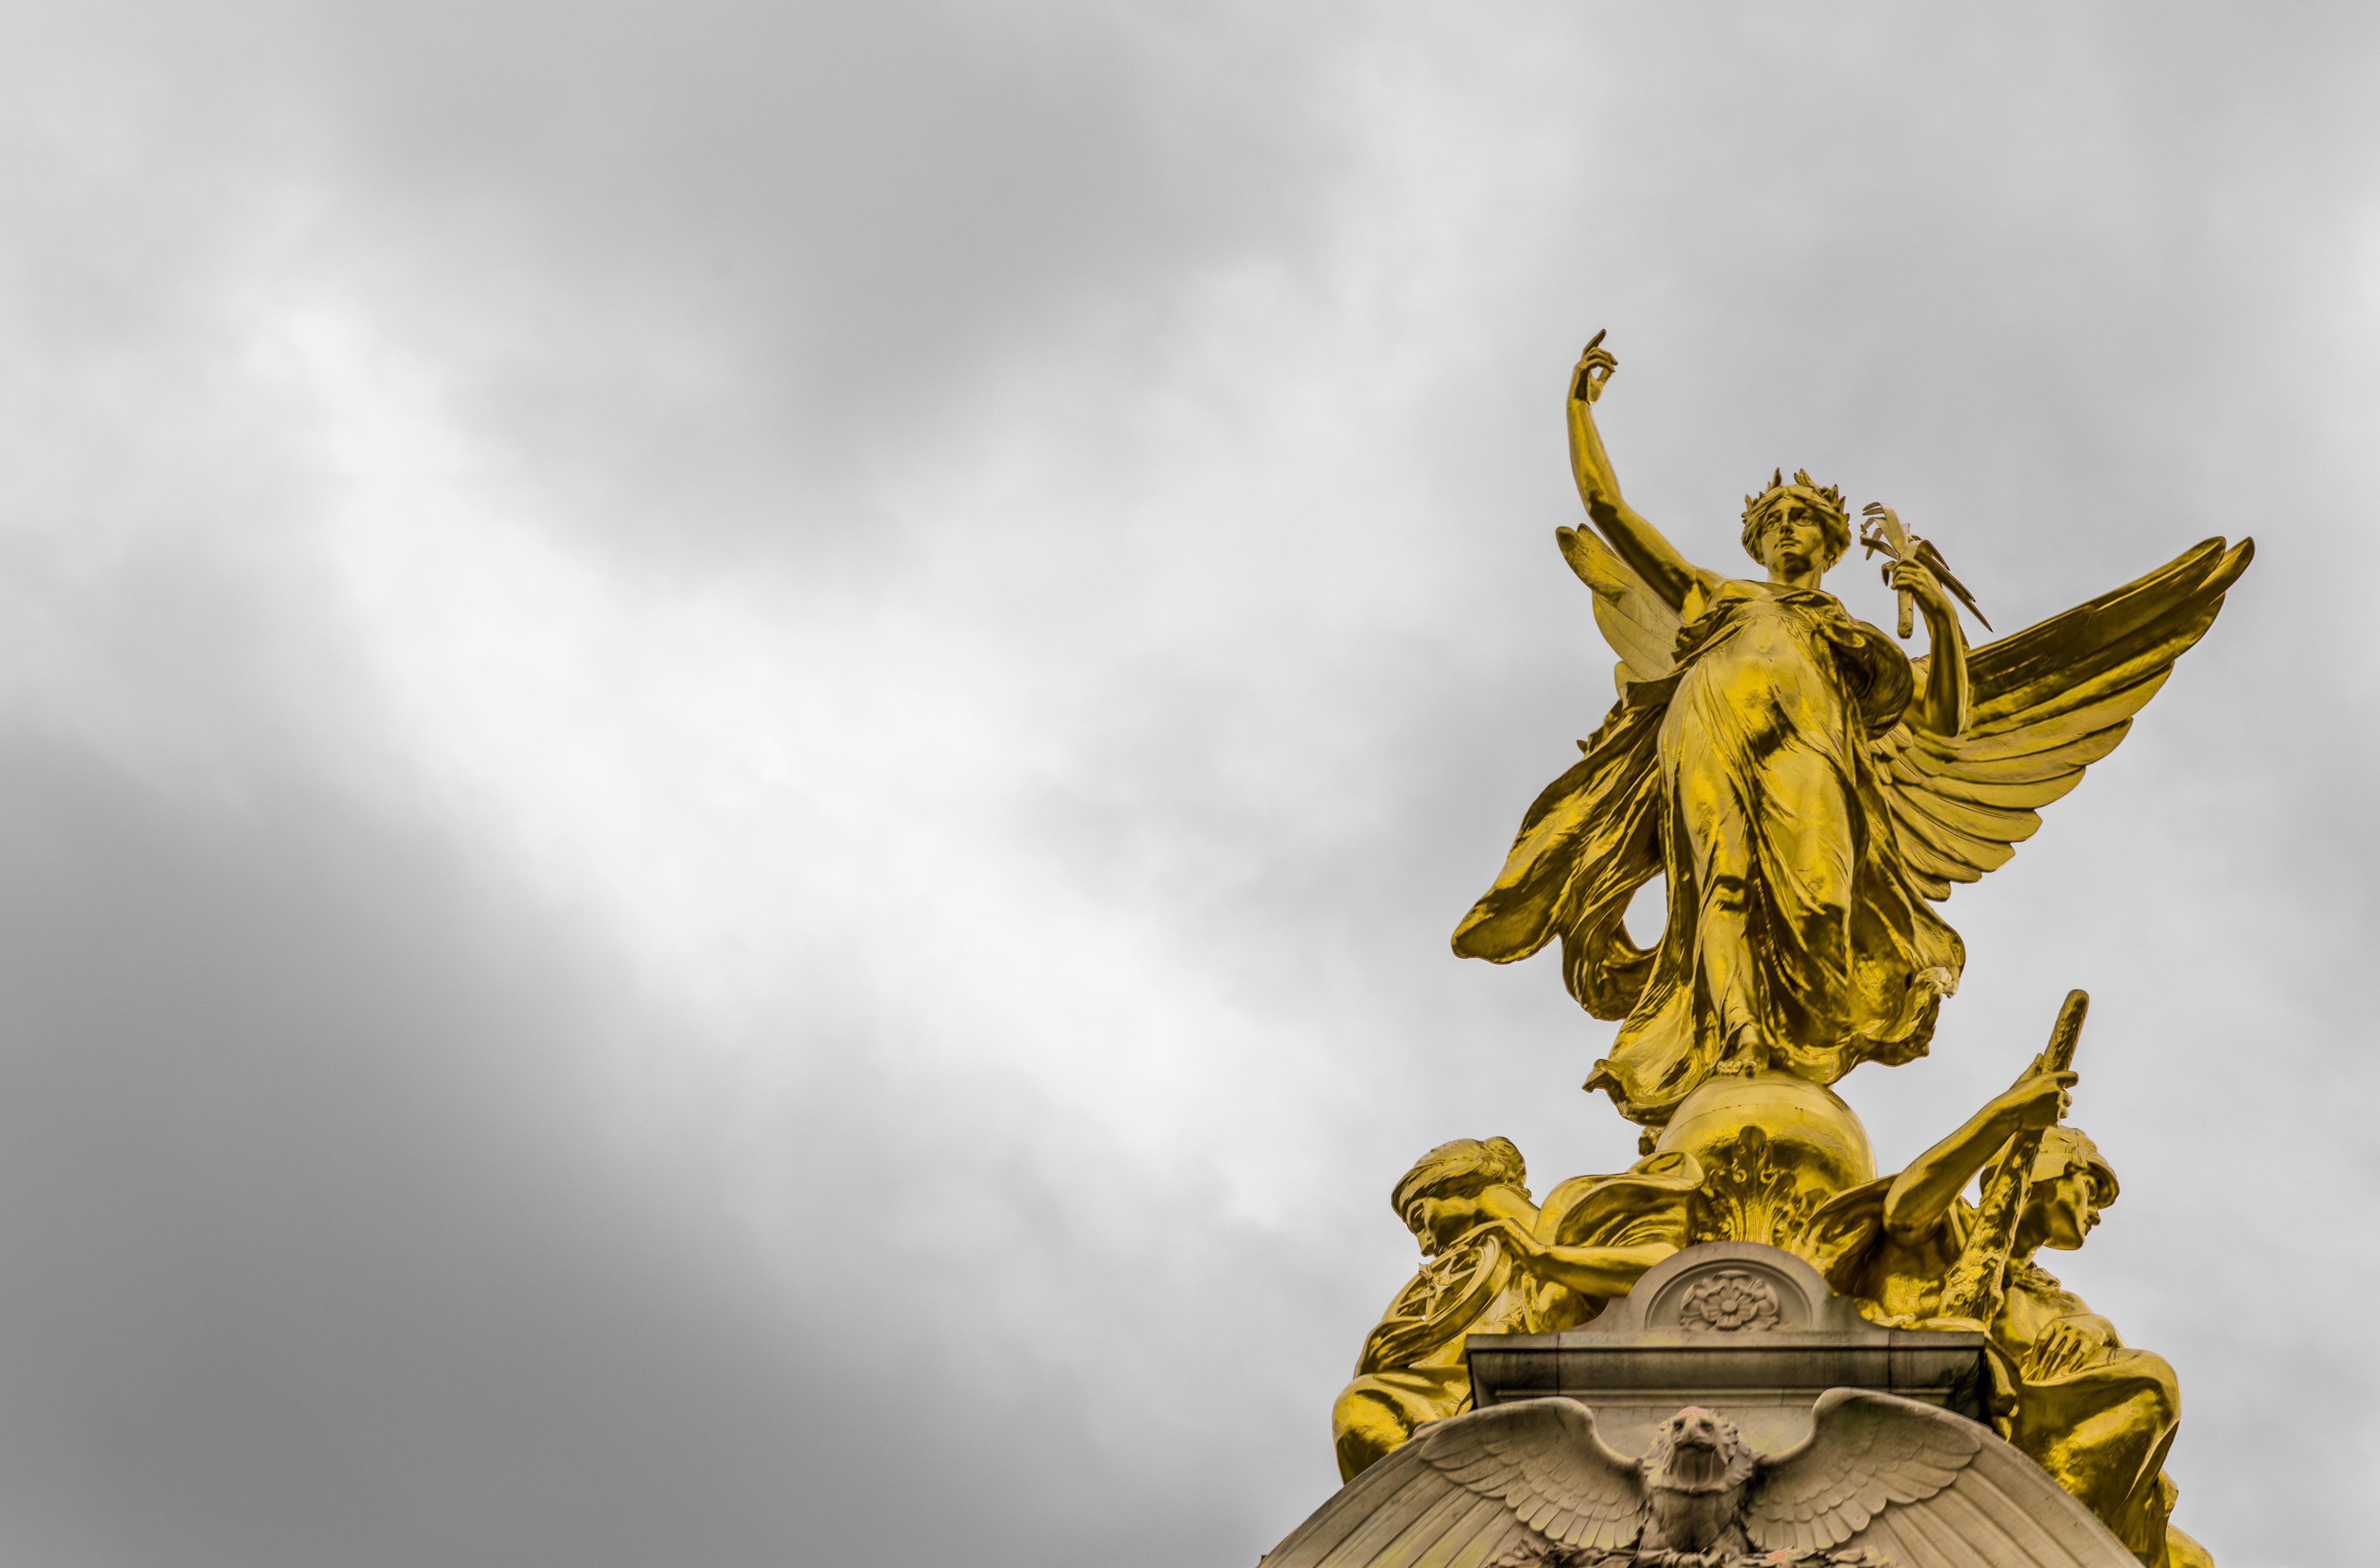 Golden Angel Statue, Angel, Golden, Religion, Statue, HQ Photo